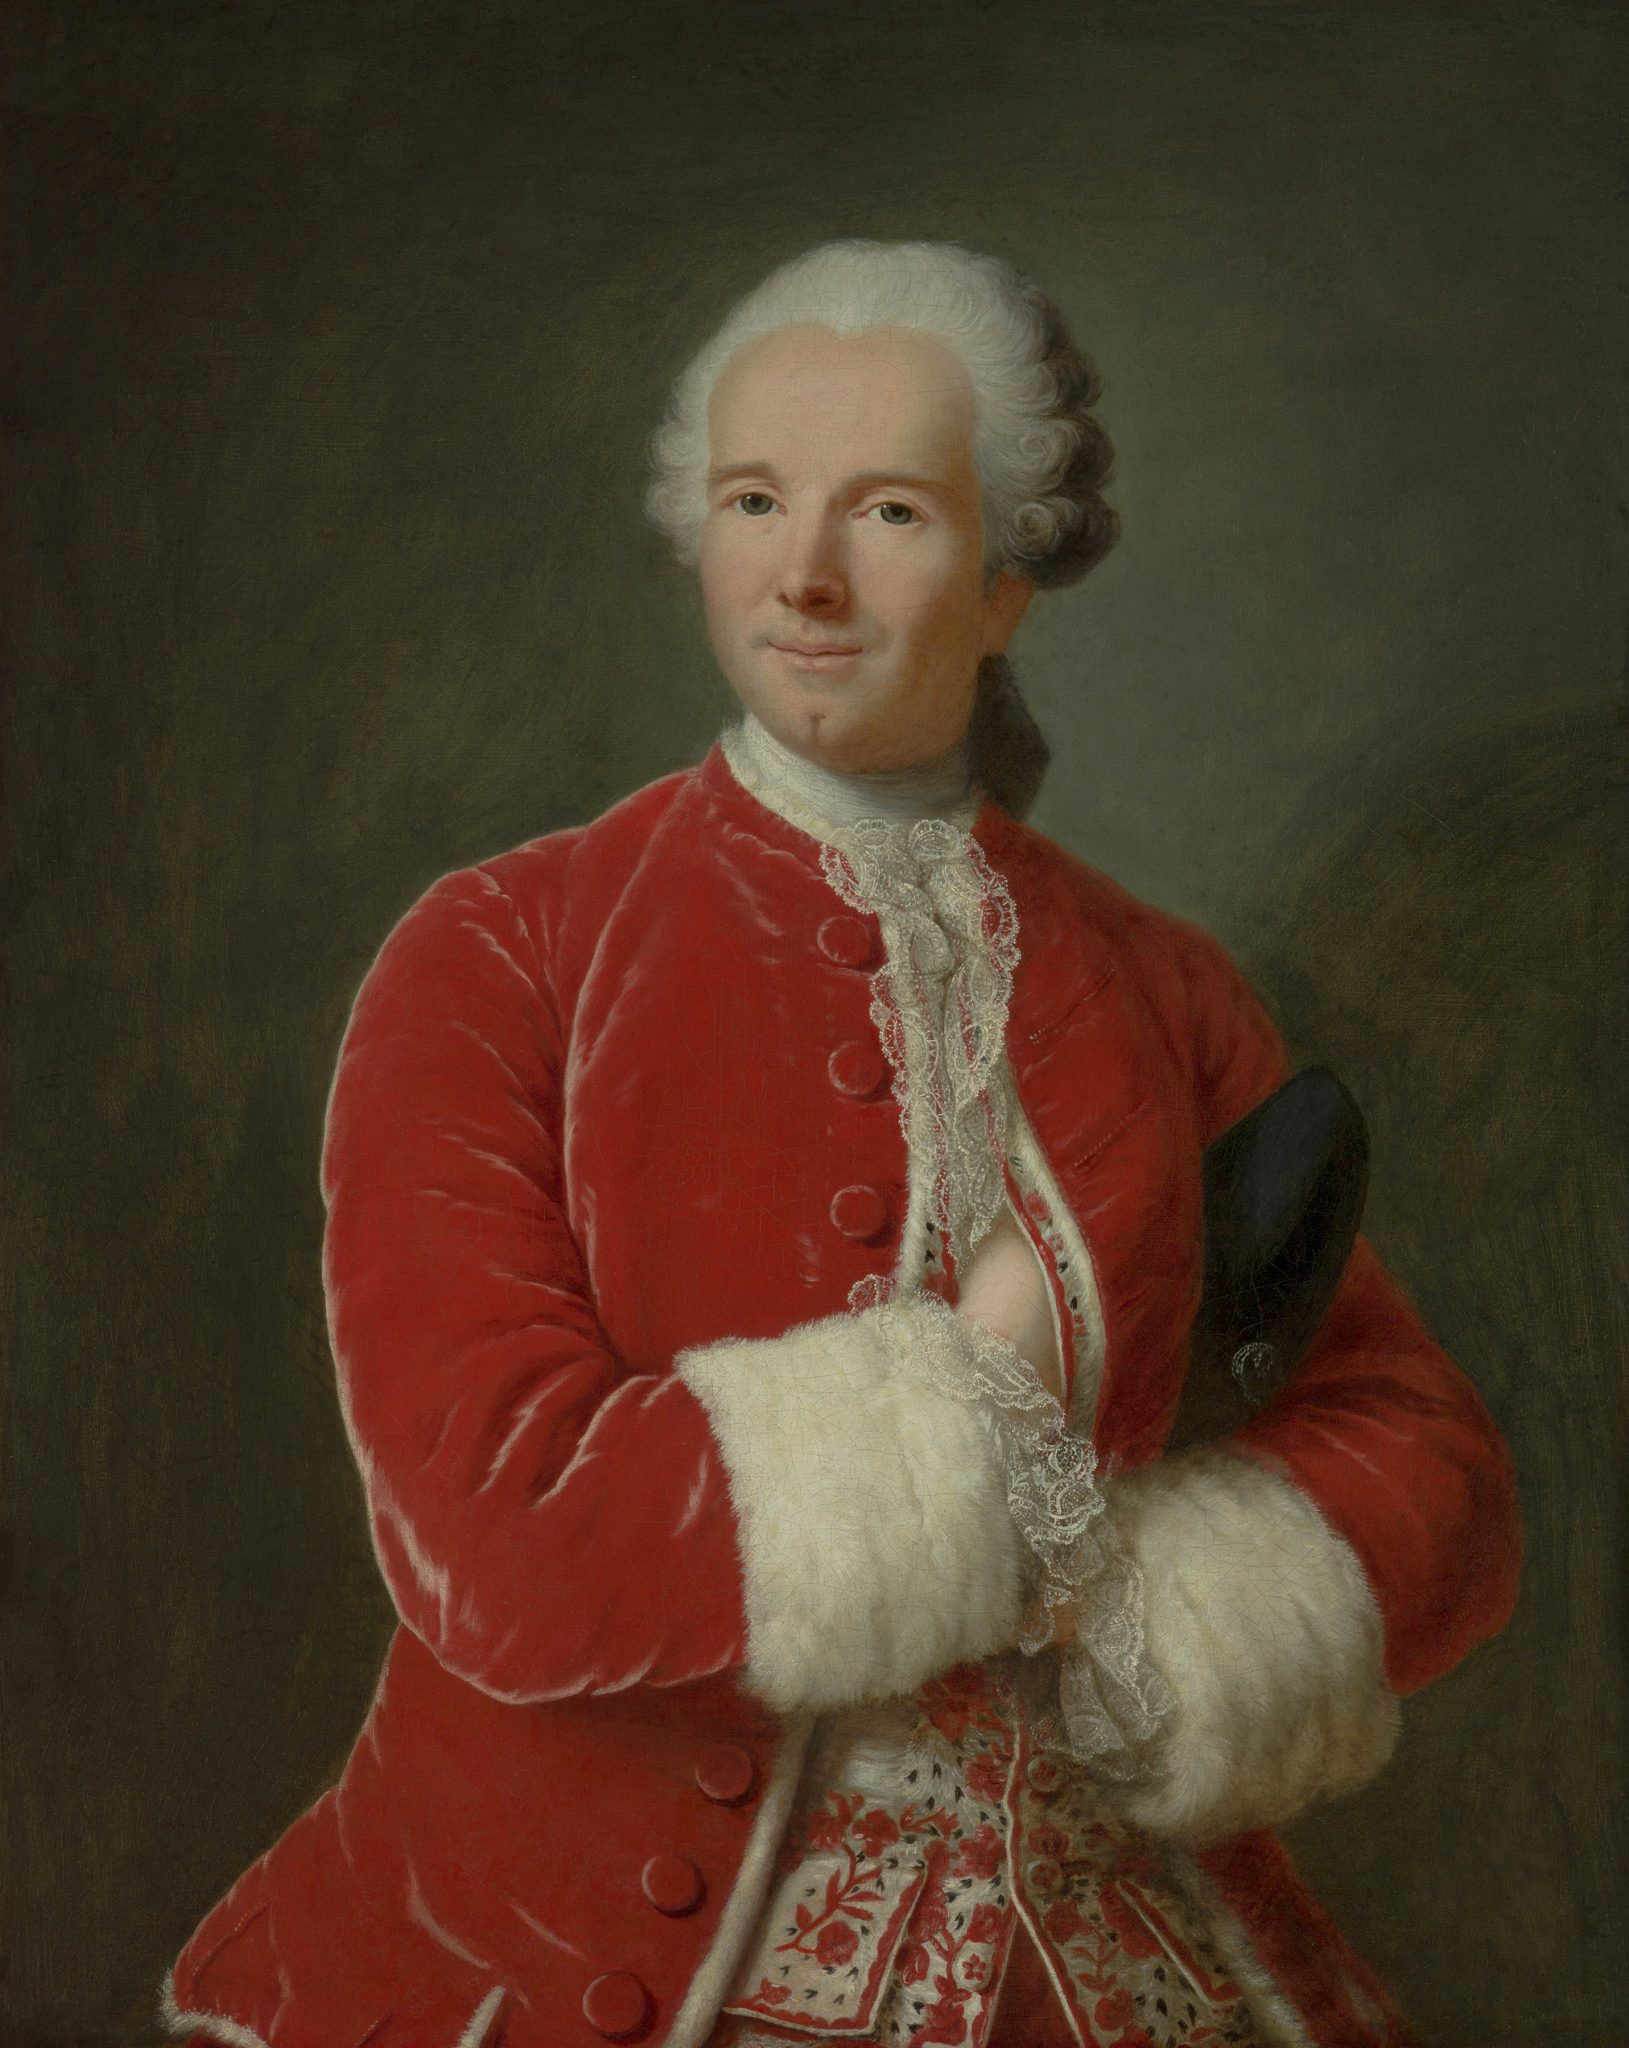 Loir, Marianne ~ Monsieur de Fontaine